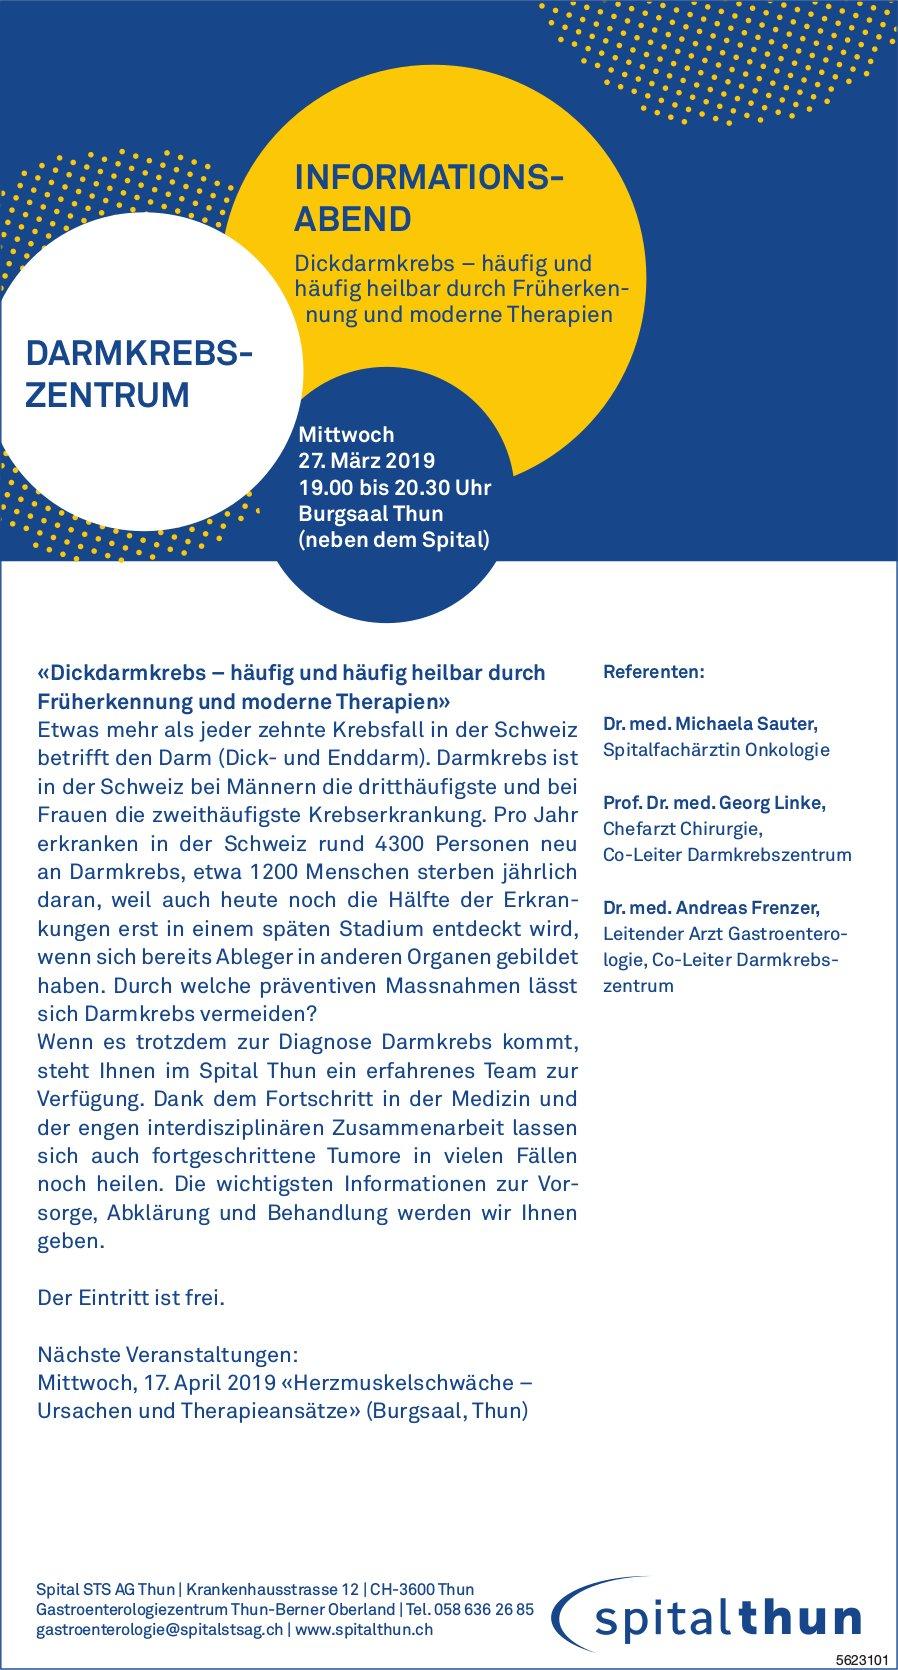 Spital Thun - Informationsabend über Darmkrebs am 27. März